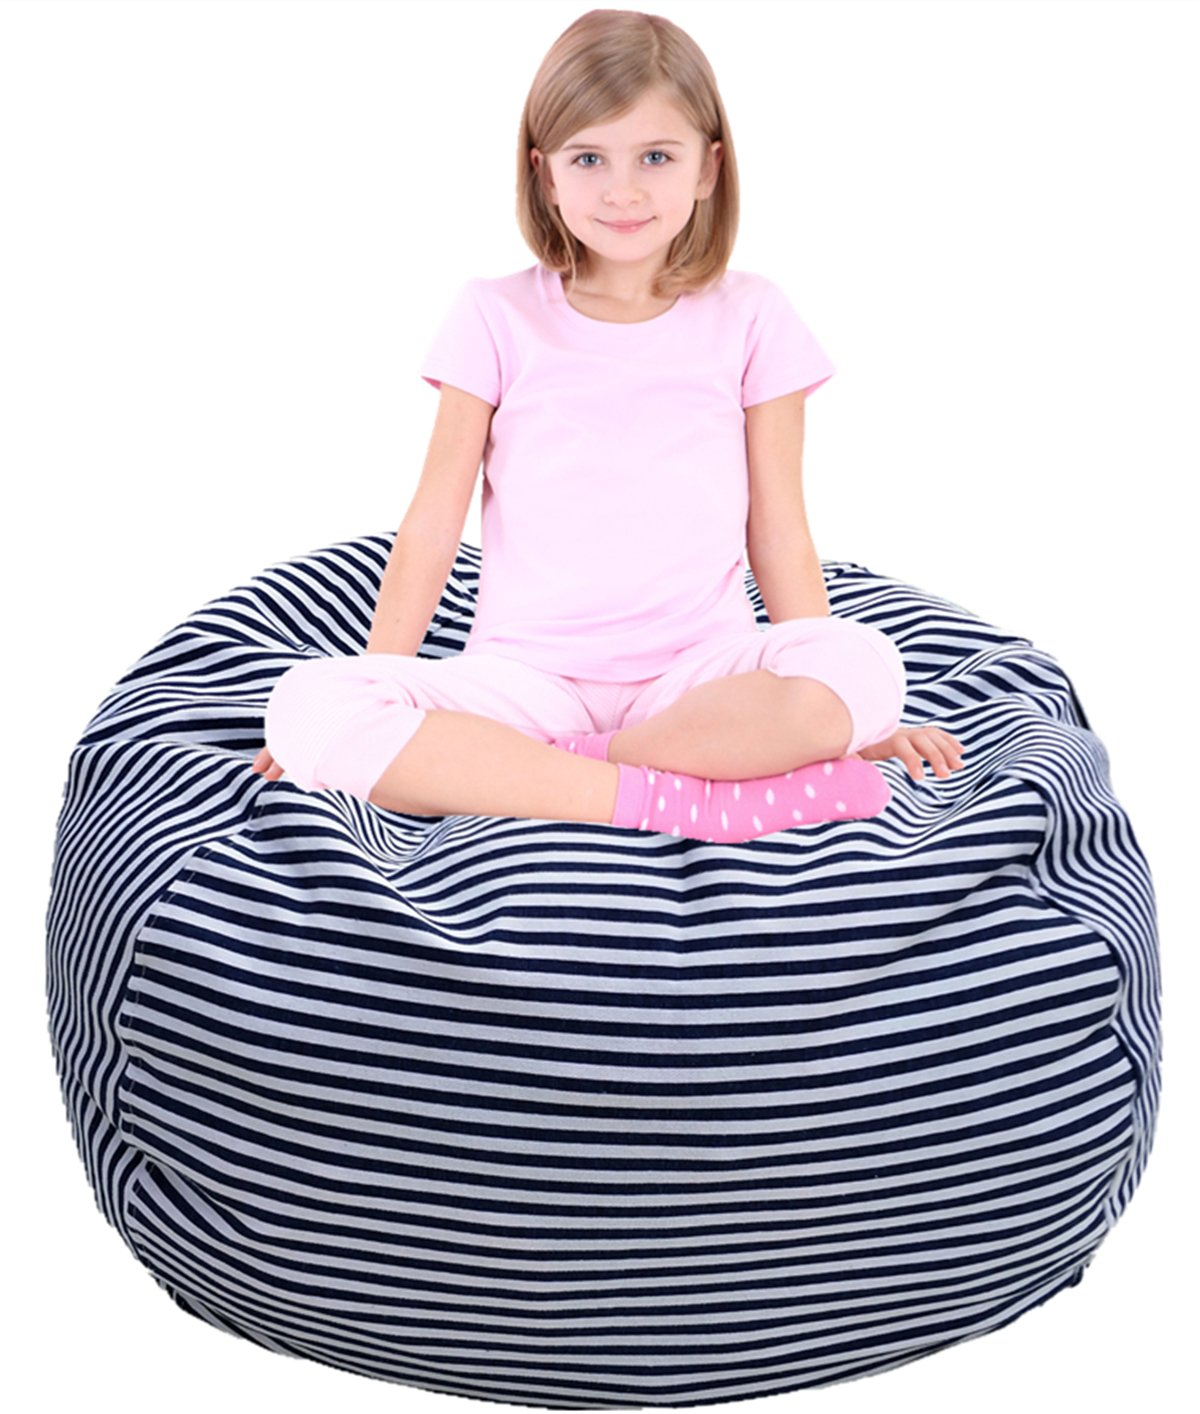 Stuffed Animal Storage Bean Bag Chair | Extra Long Zipper Stuffed Storage Bag | Kids Bean Bag | Stuffed Animal Storage Bag | Premium Corduroy Pink - 30 EDCMaker